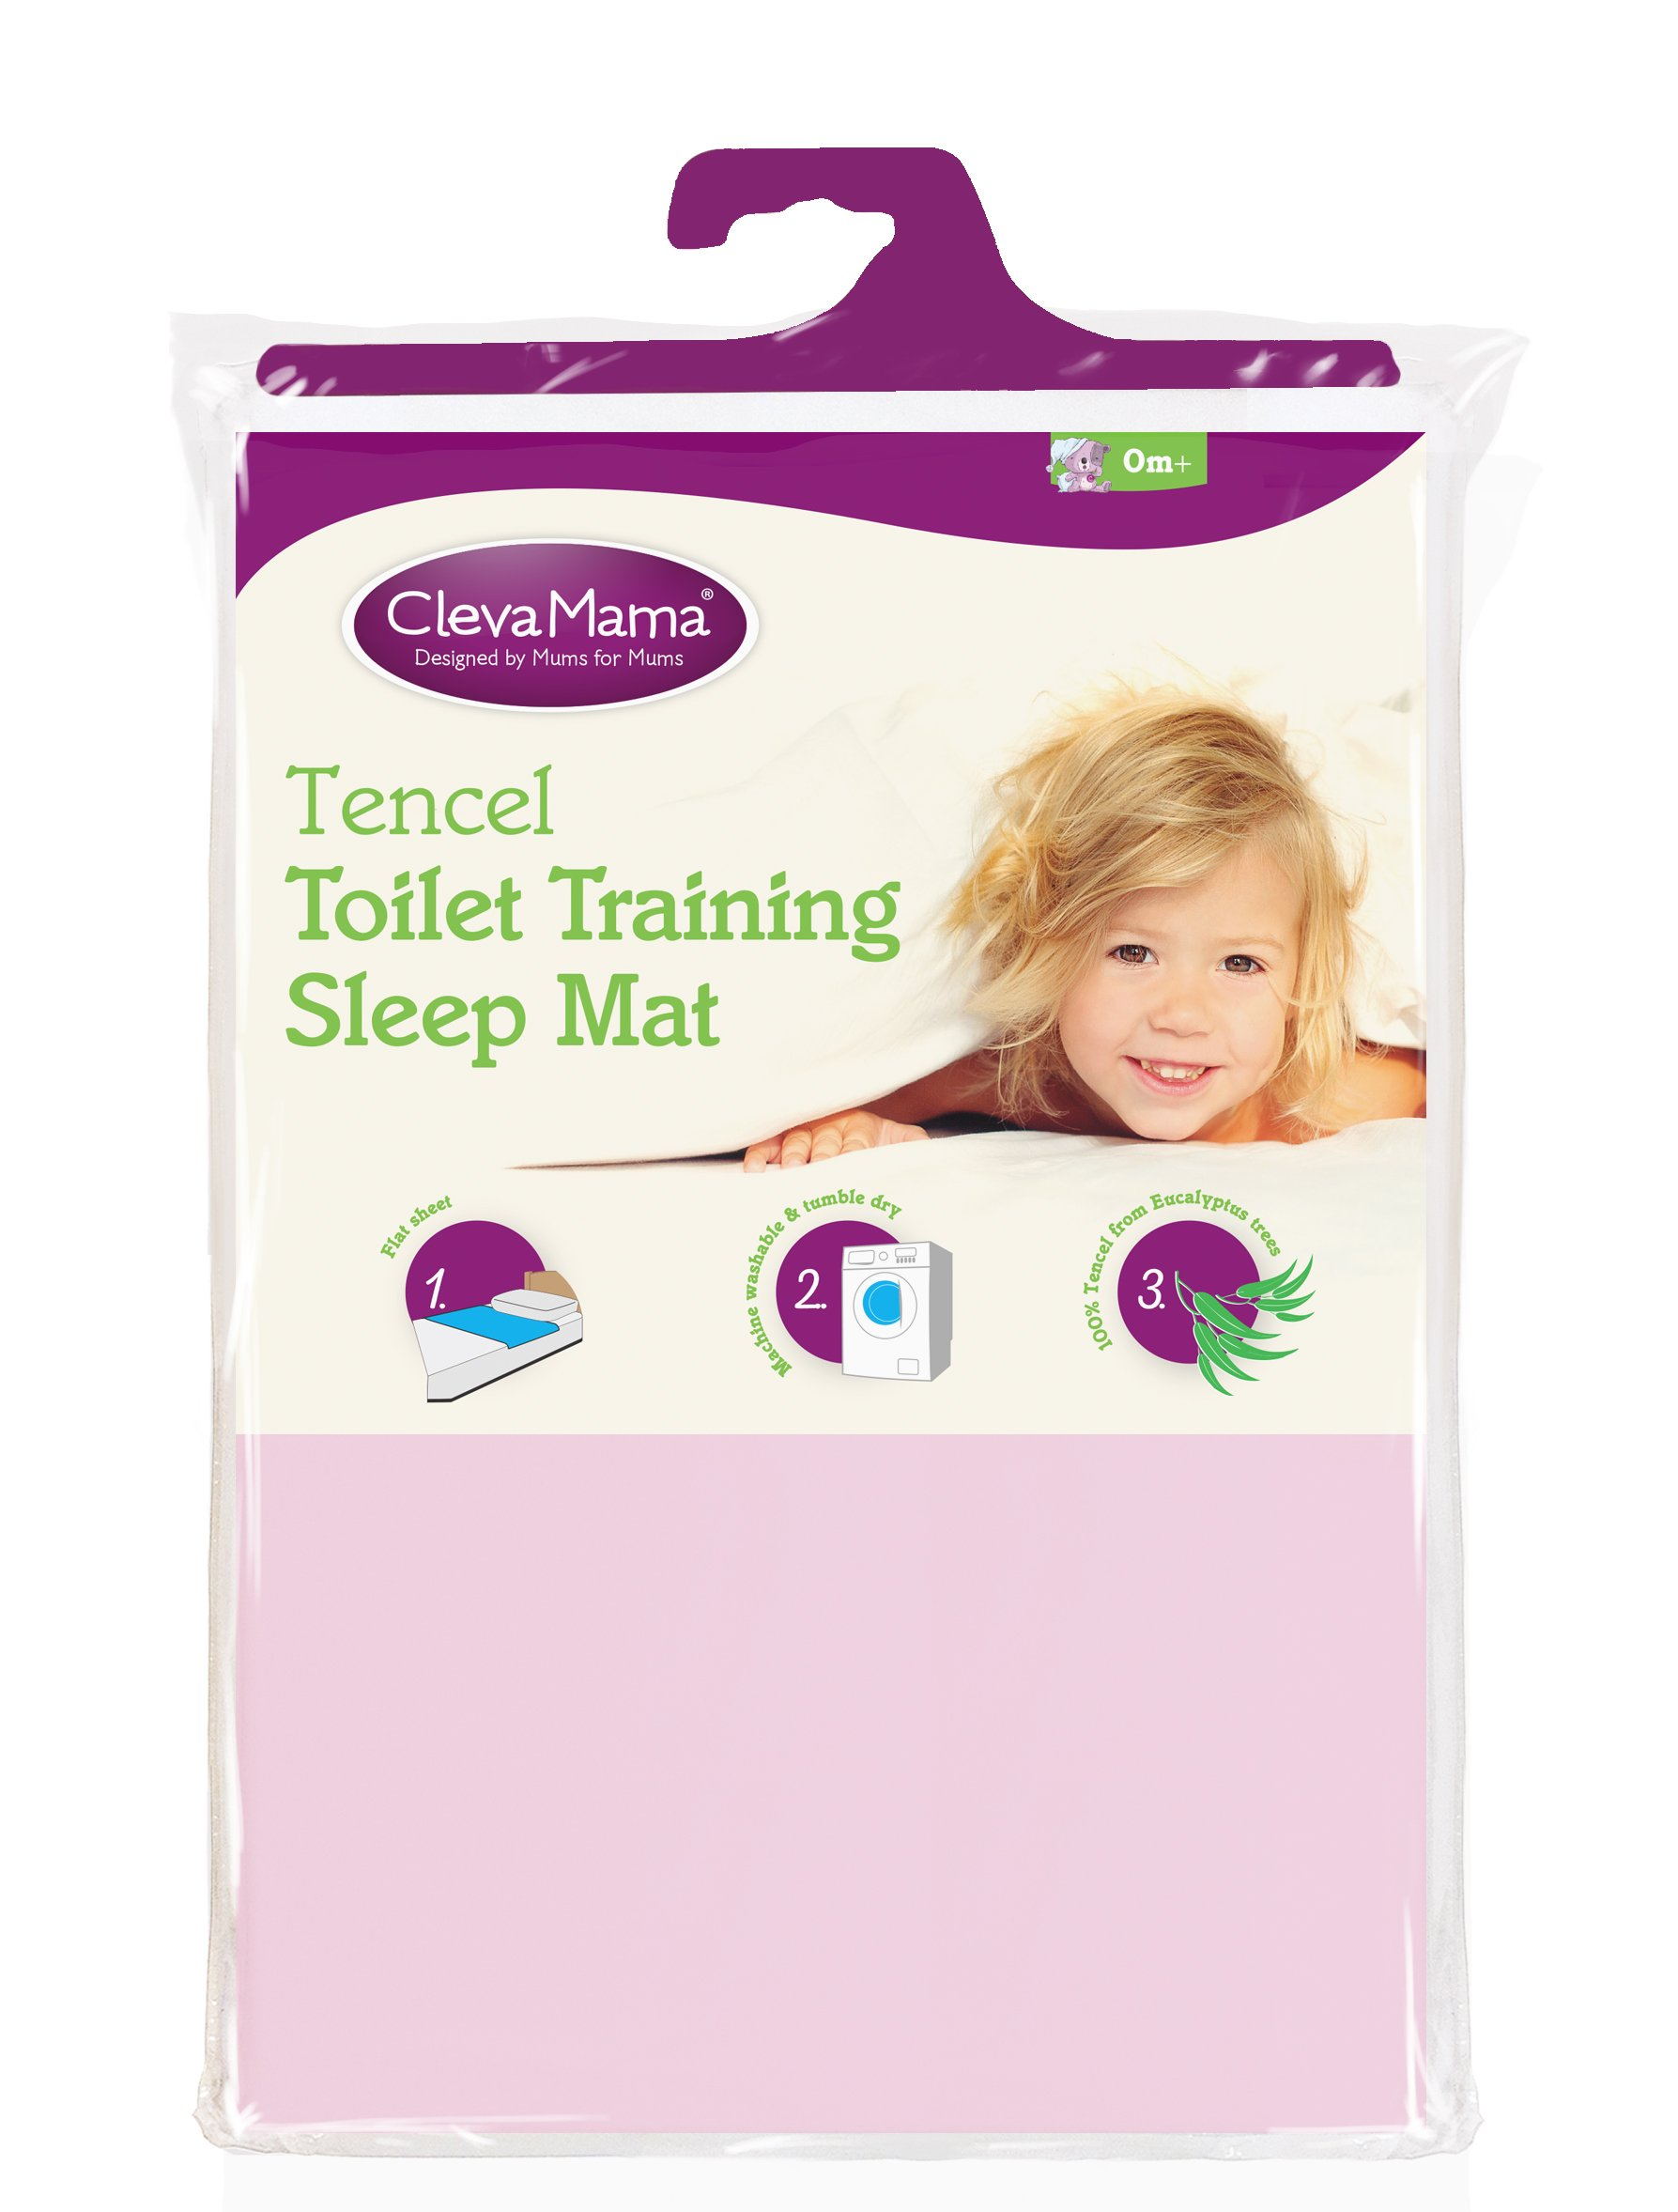 Clevamama - Toilet Training Sleep Mat - Waterproof Bed Protector in Tencel - Pink